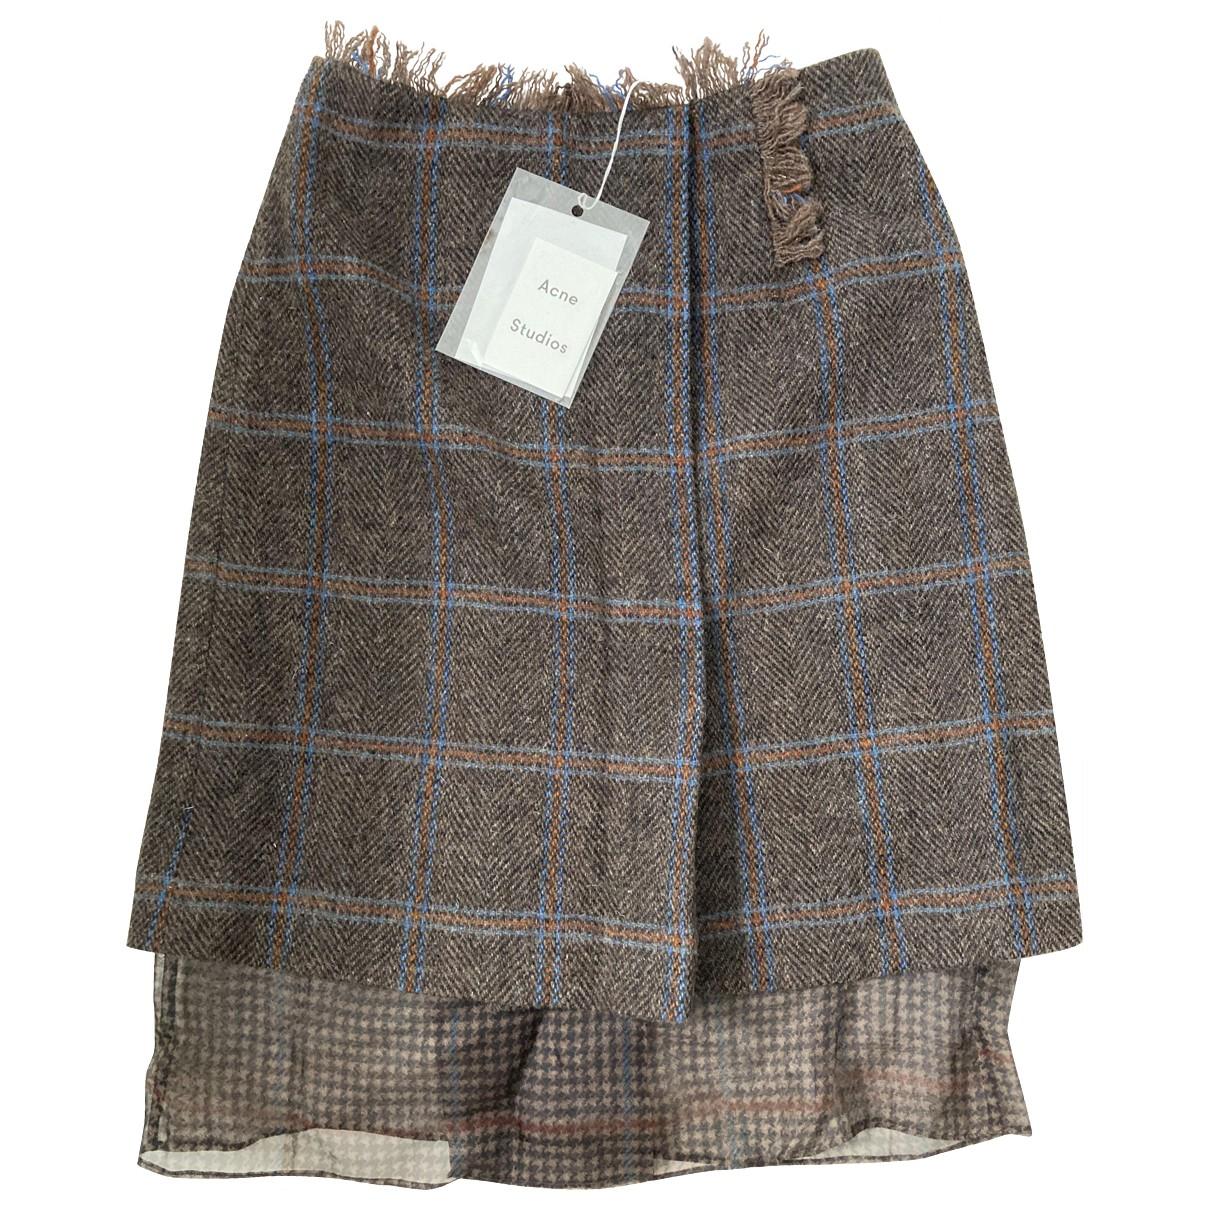 Acne Studios \N Wool skirt for Women XS International